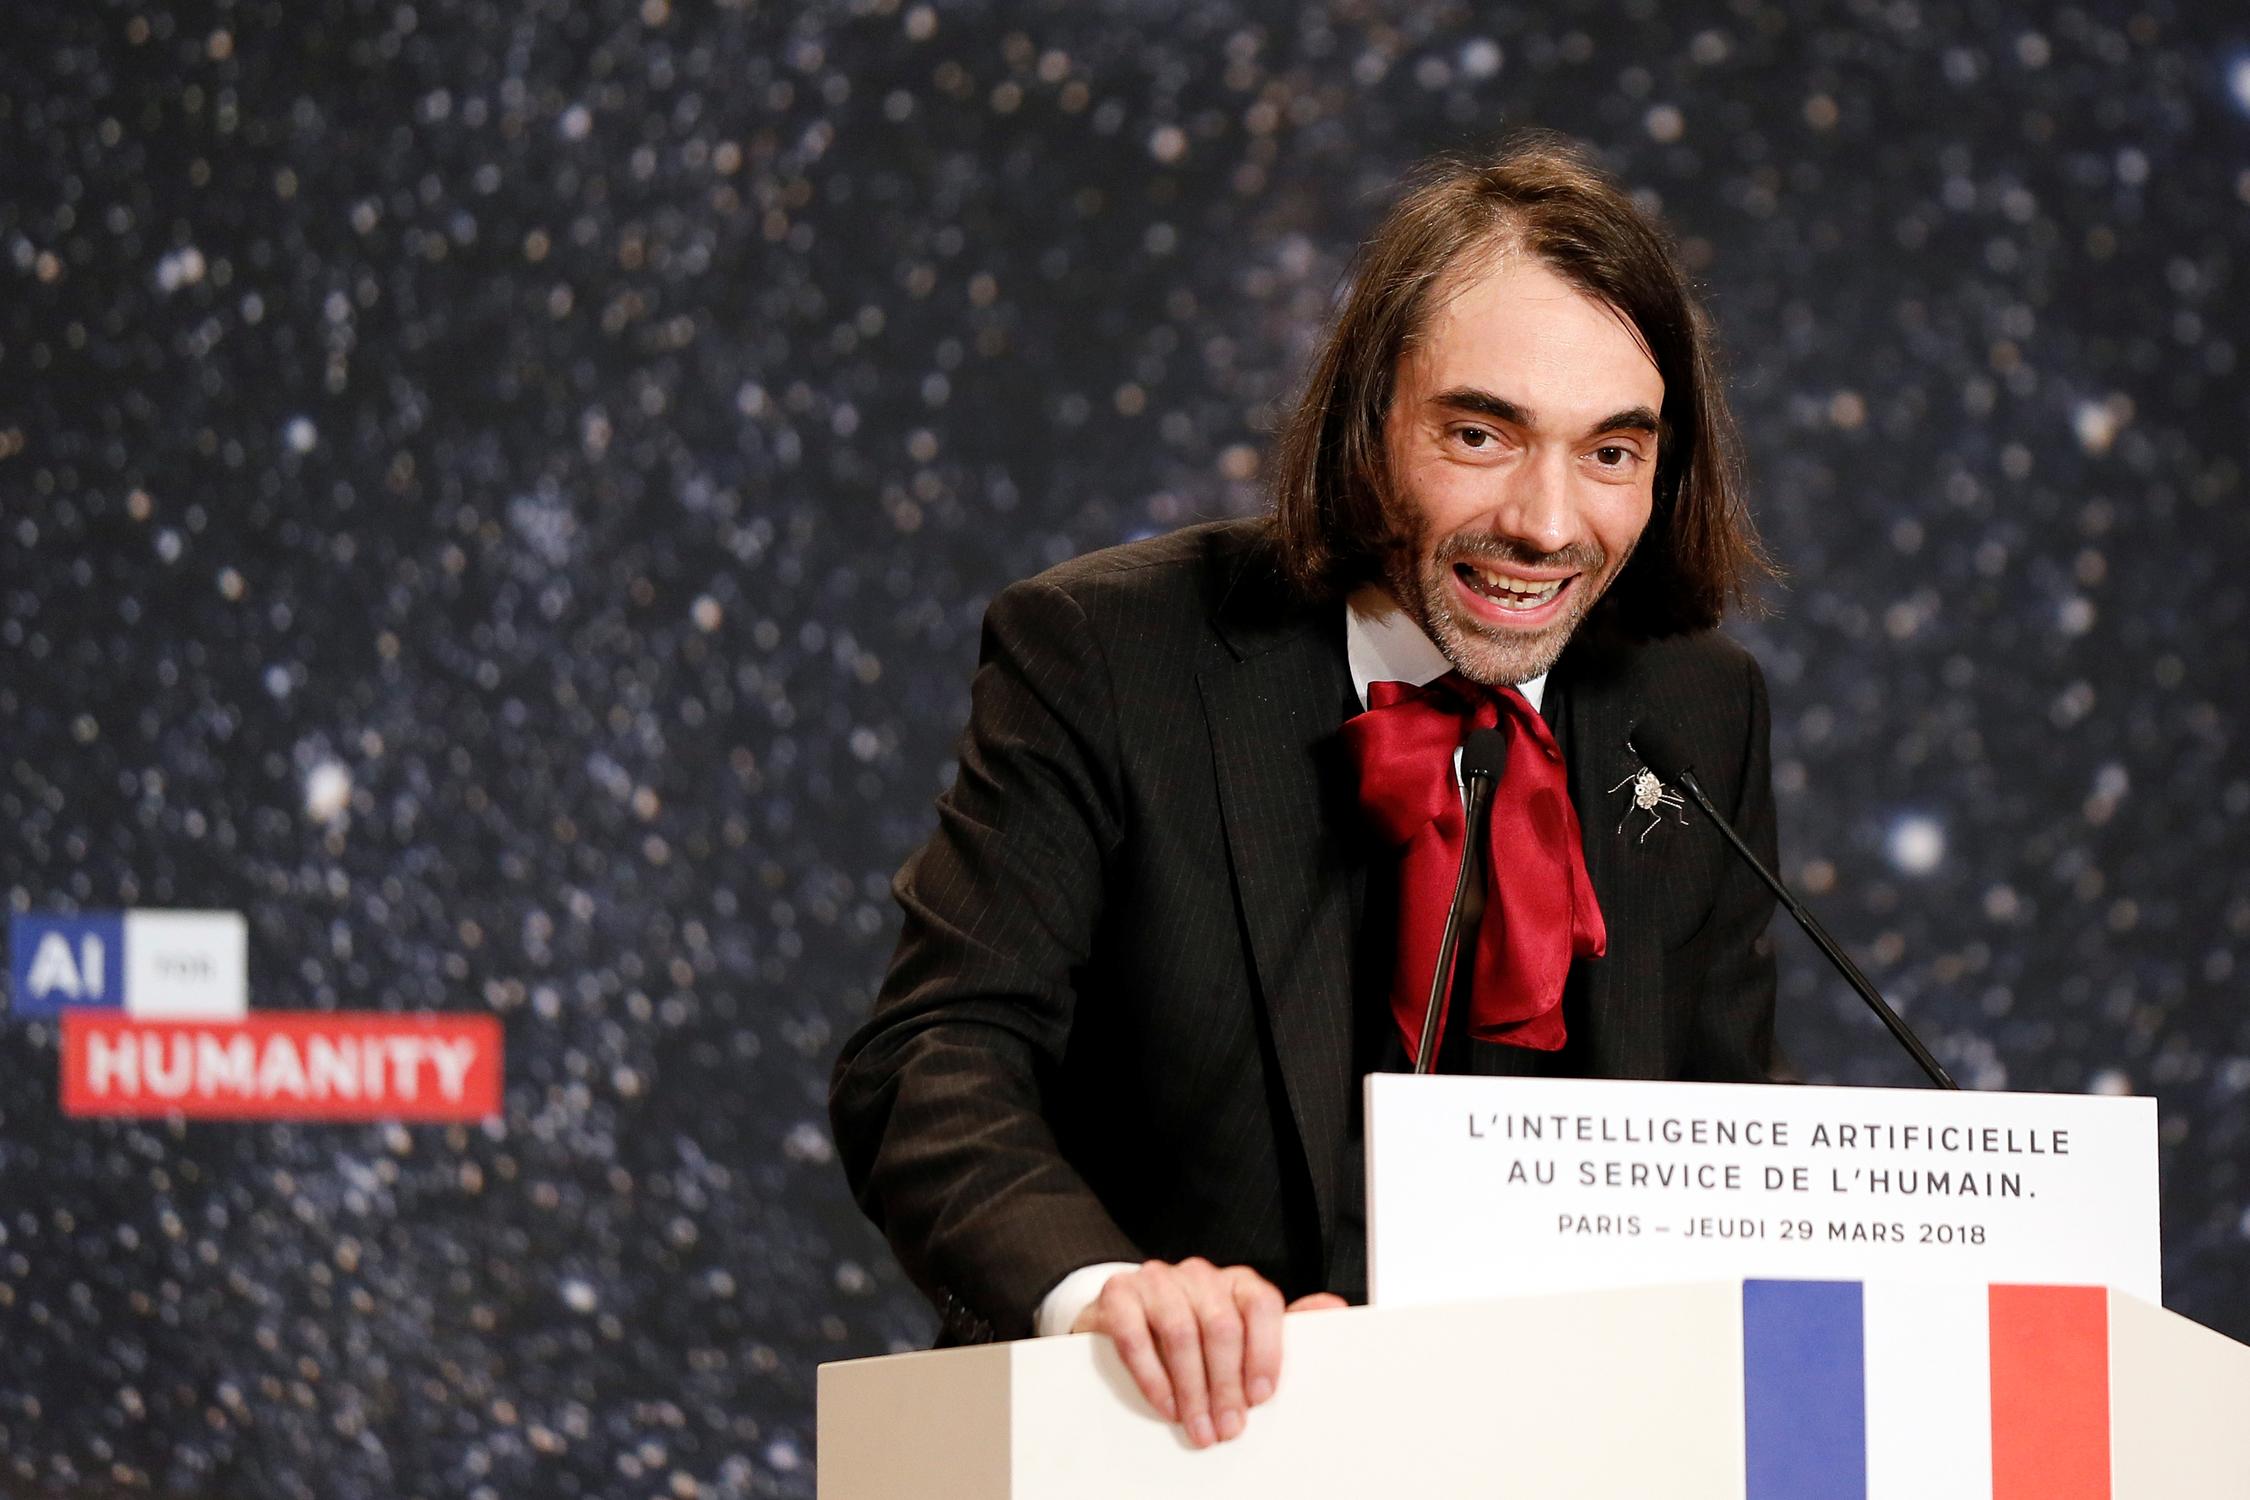 Cedric Villani, francuski matematičar i zastupnik stranke LREM